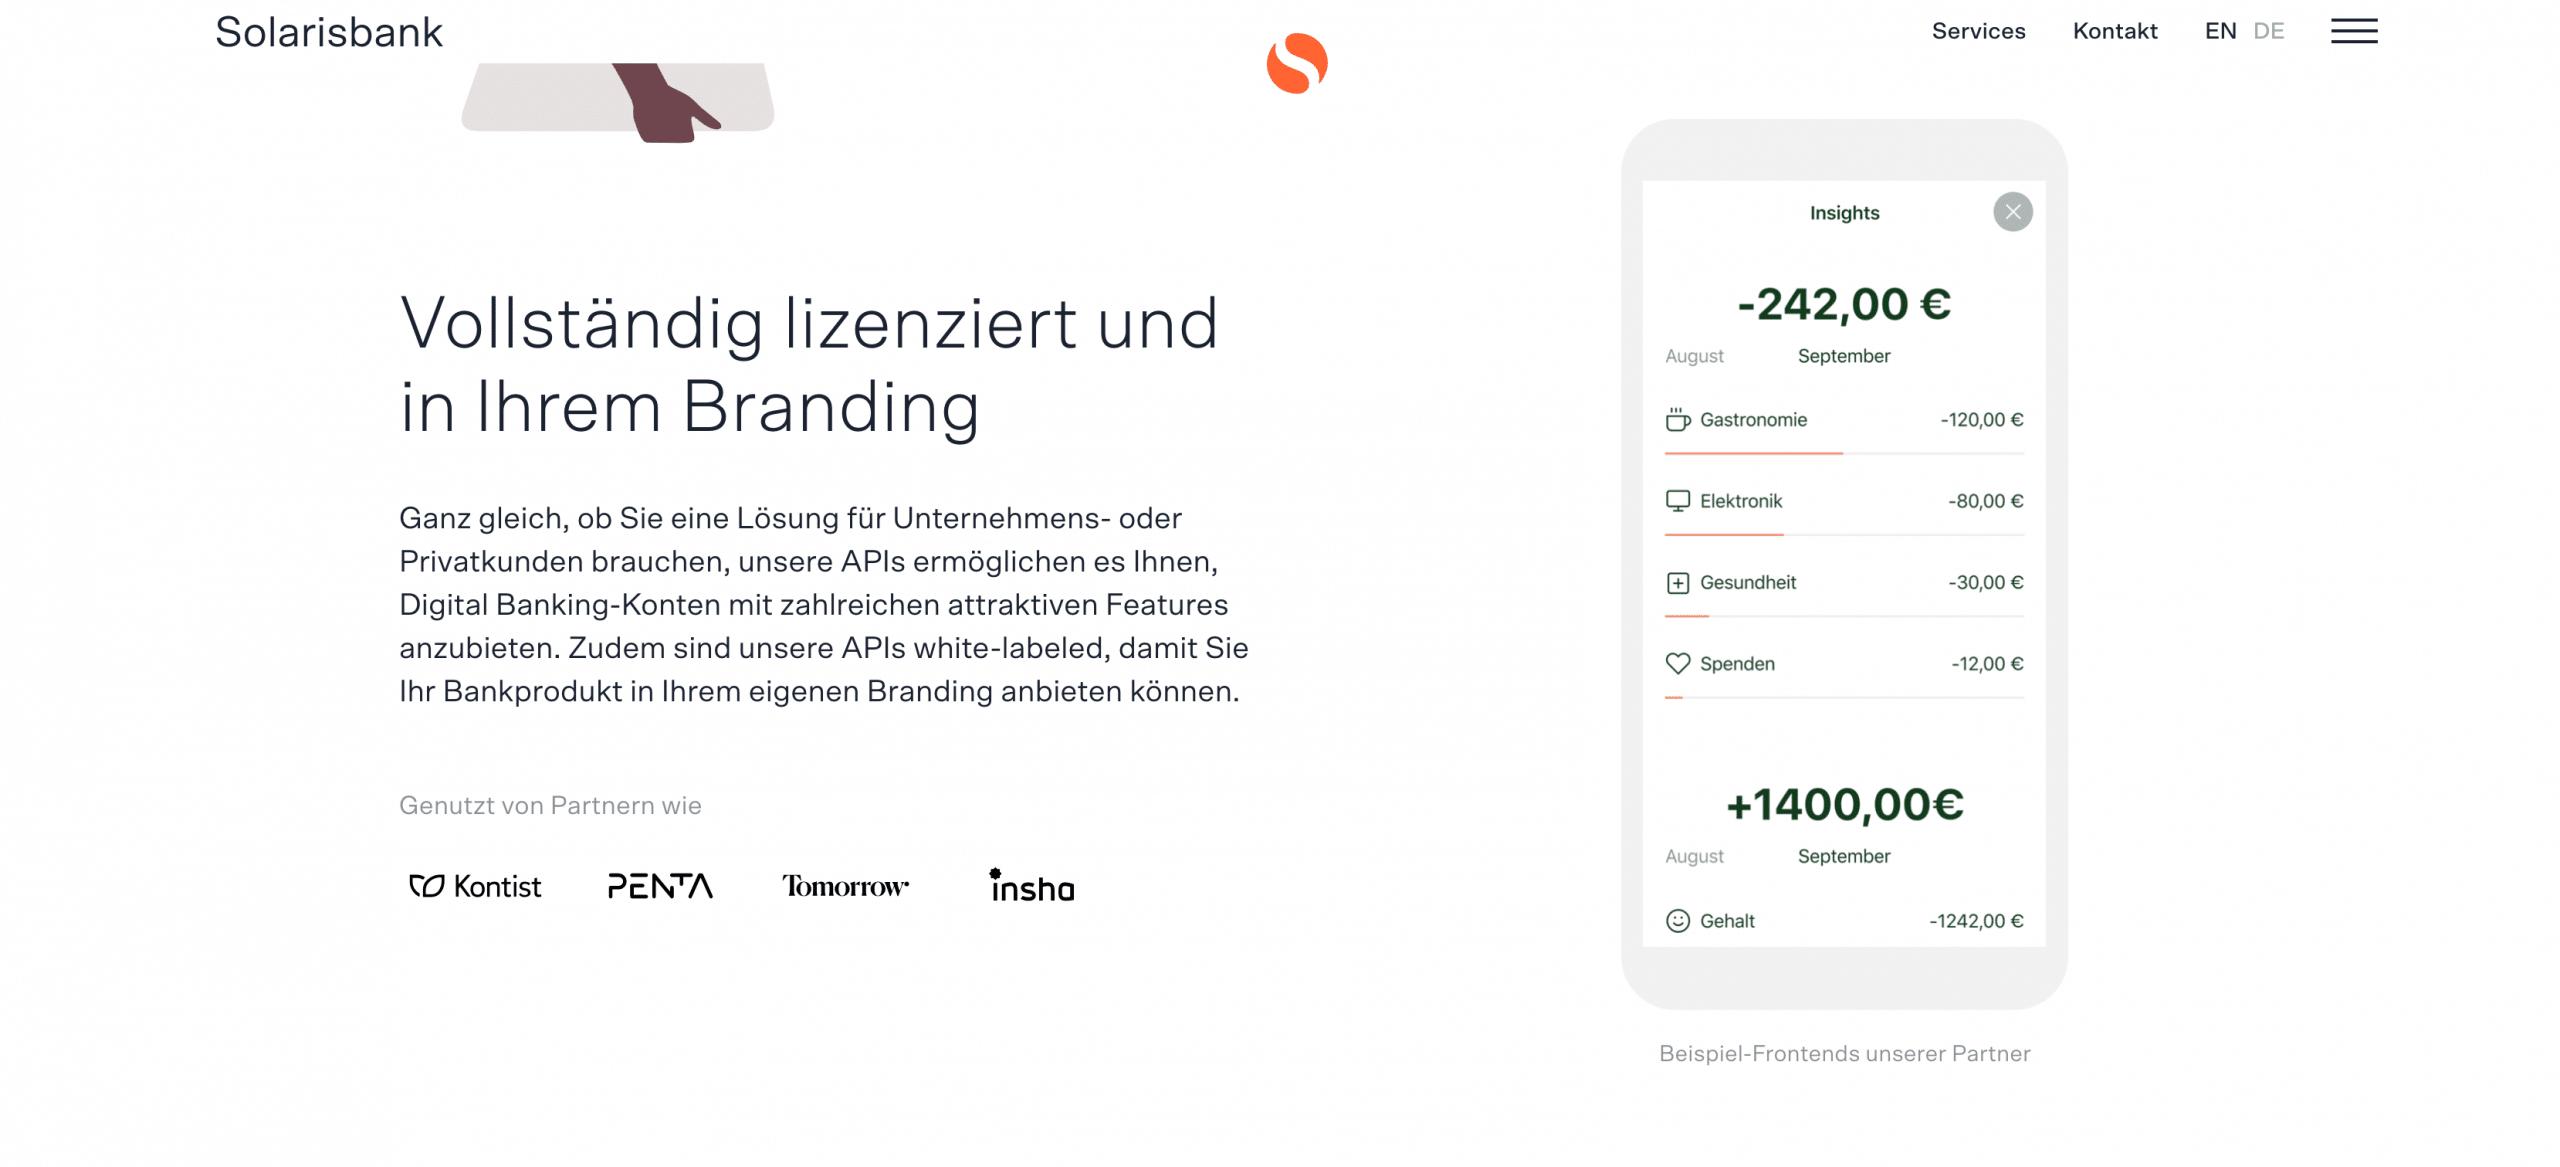 Solarisbank App